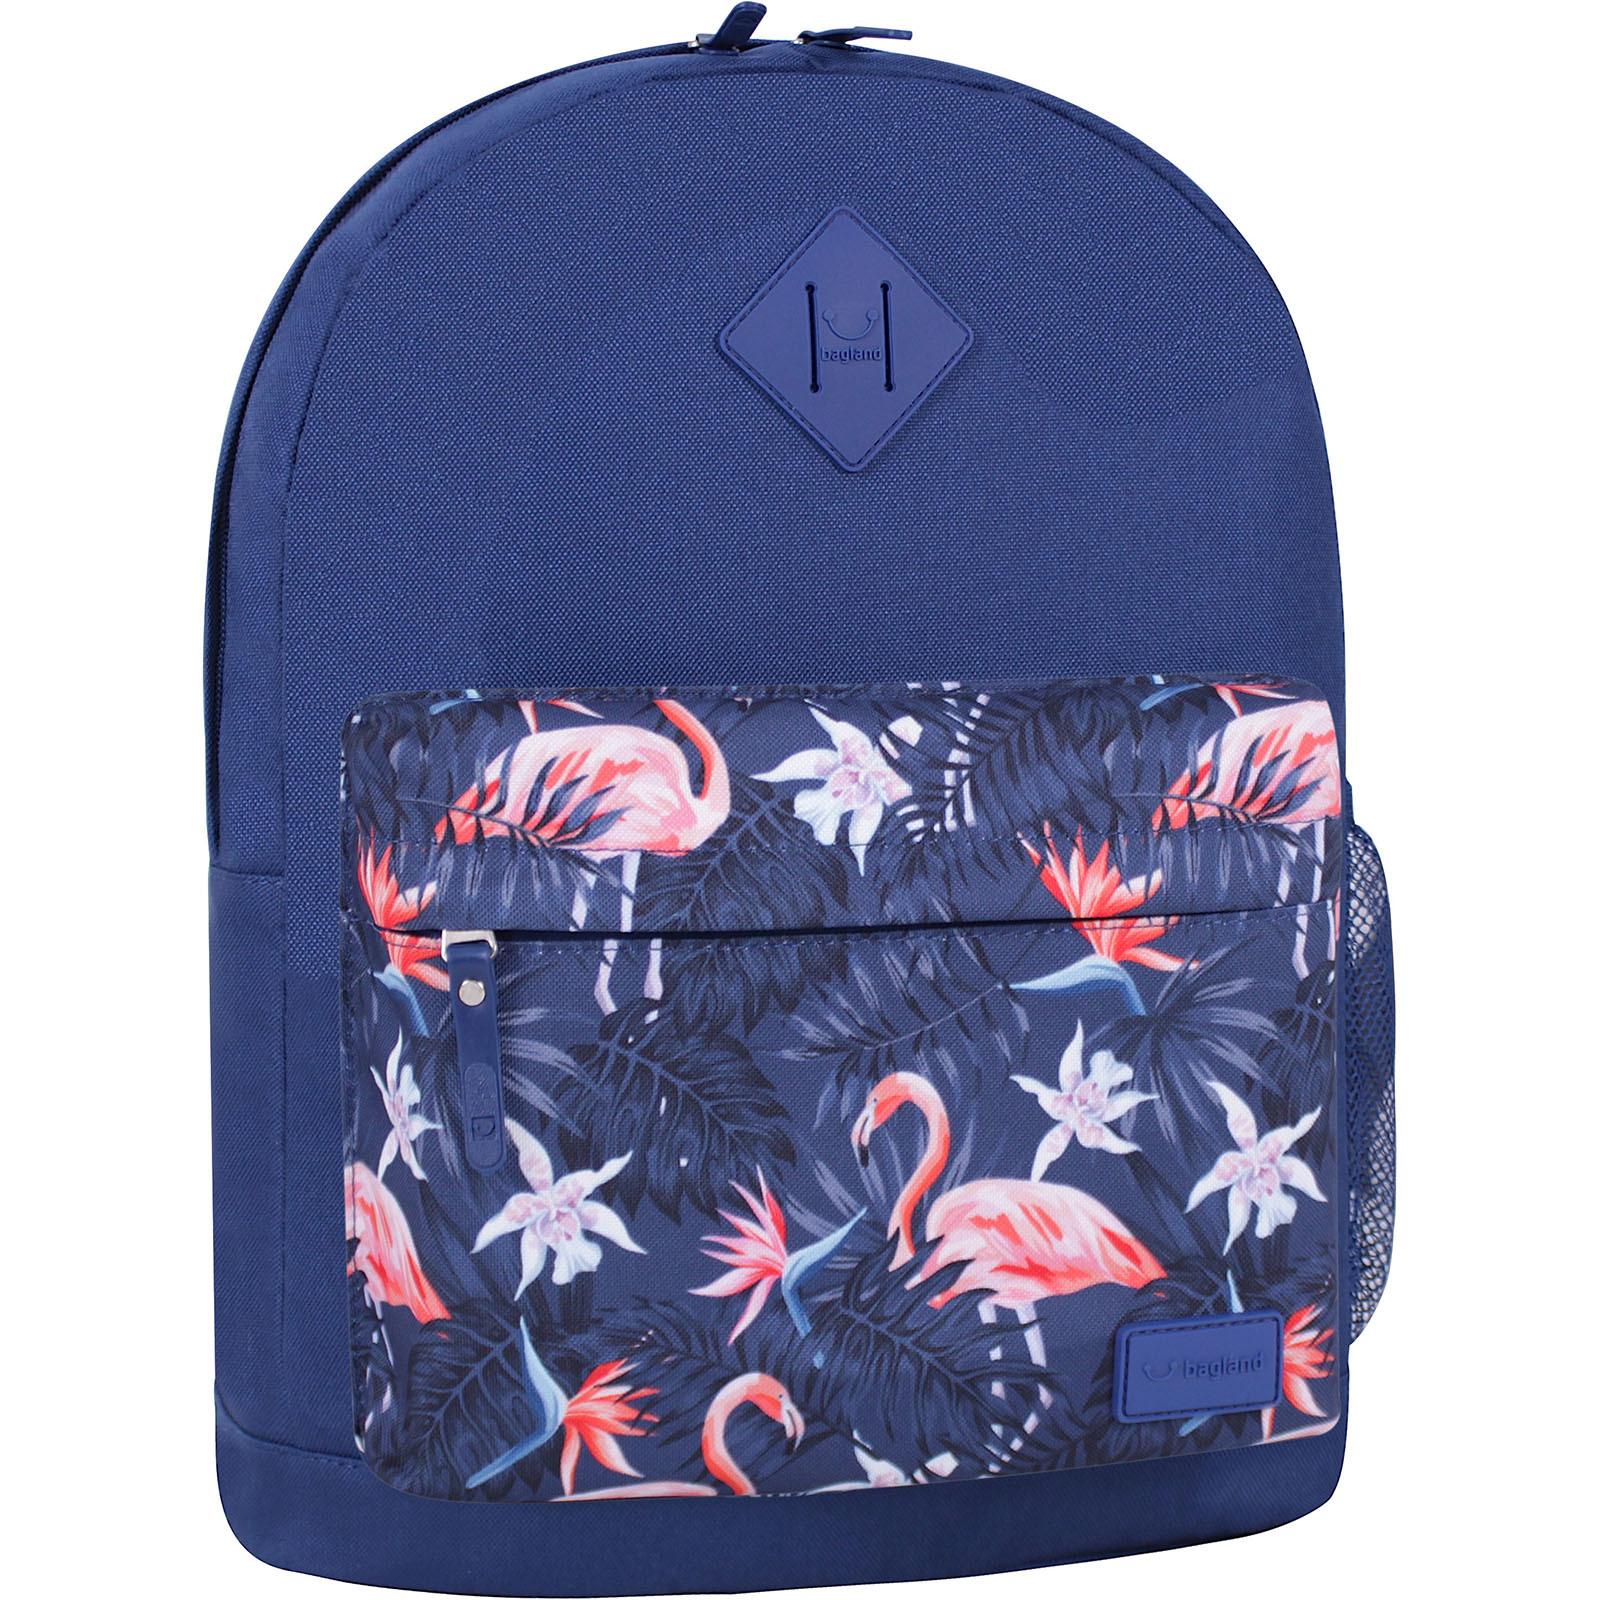 Городские рюкзаки Рюкзак Bagland Молодежный W/R 17 л. Синий 762 (00533662) IMG_6552_суб.762_-1600.jpg